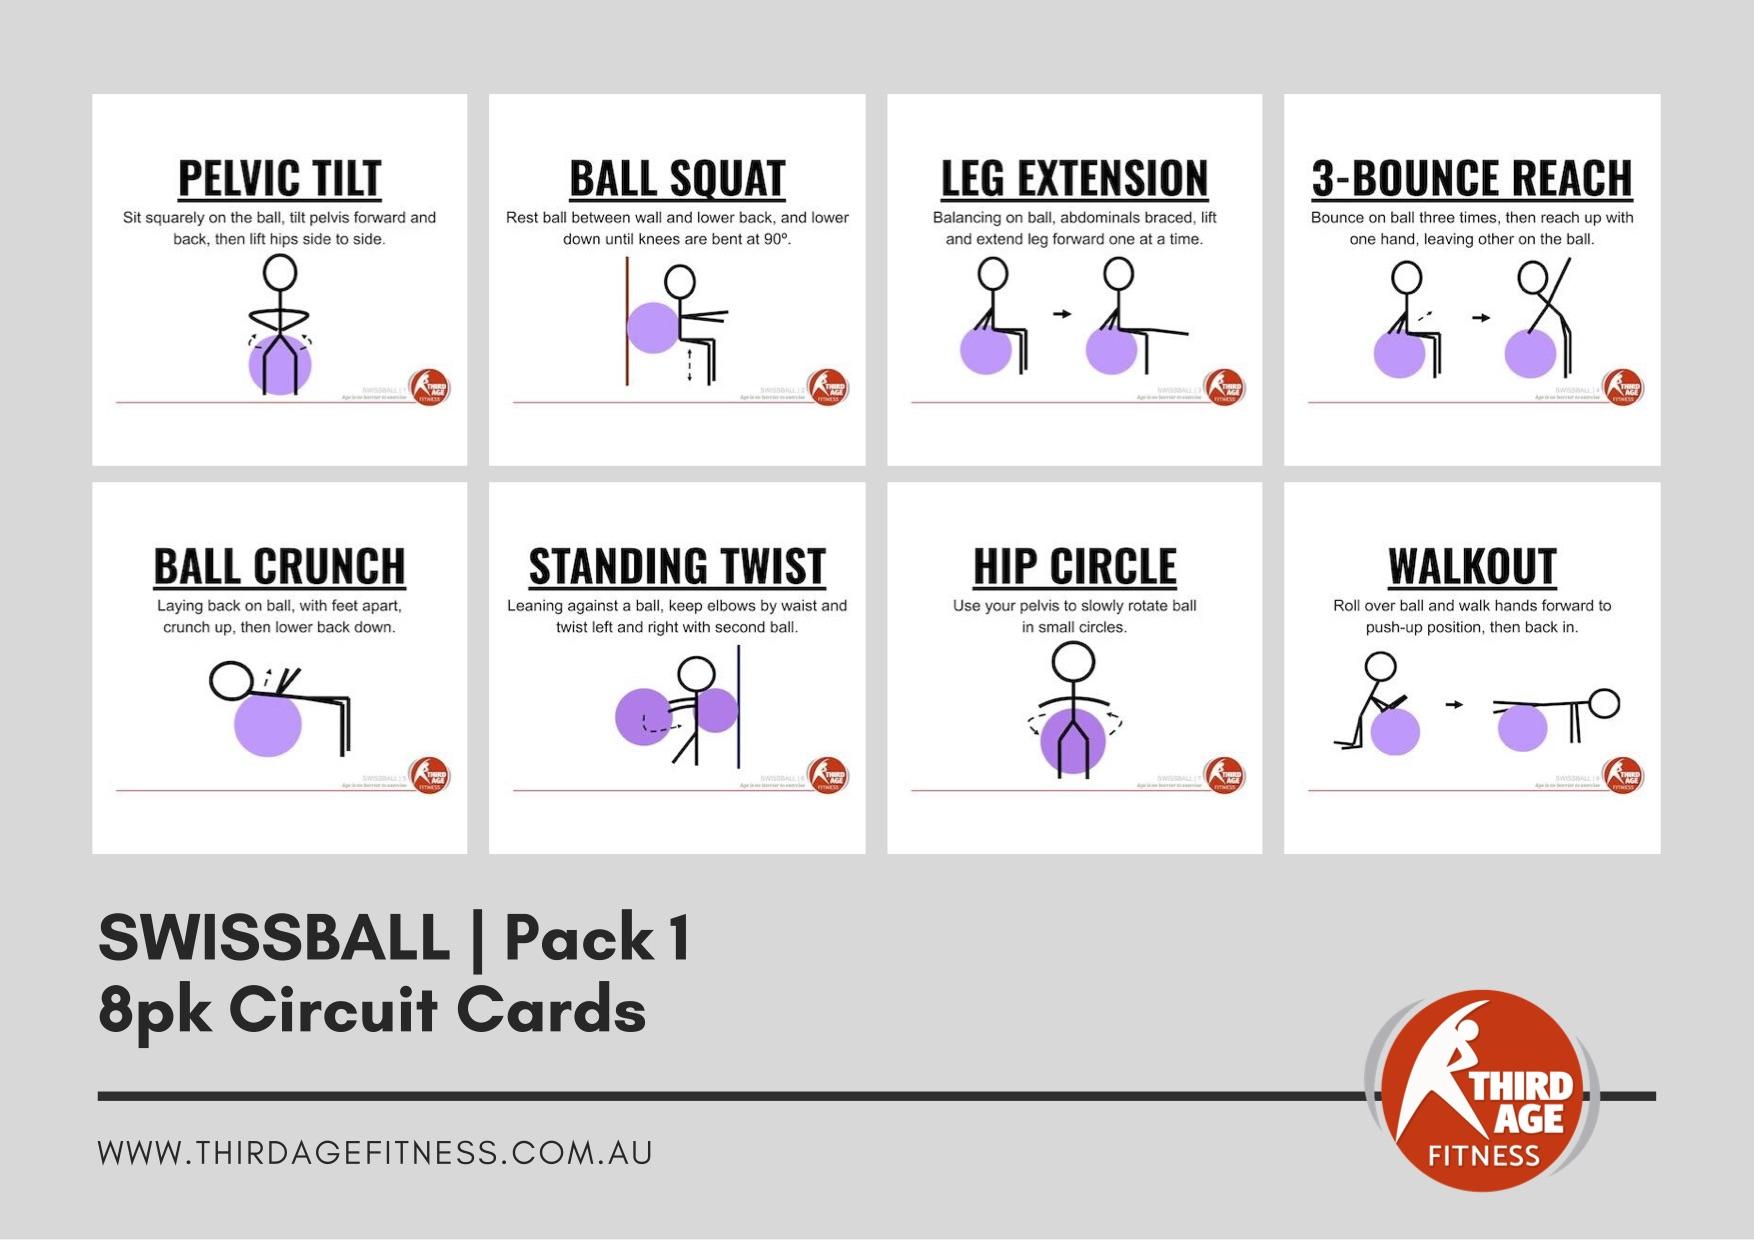 Circuit Cards - Swissball Pack 1